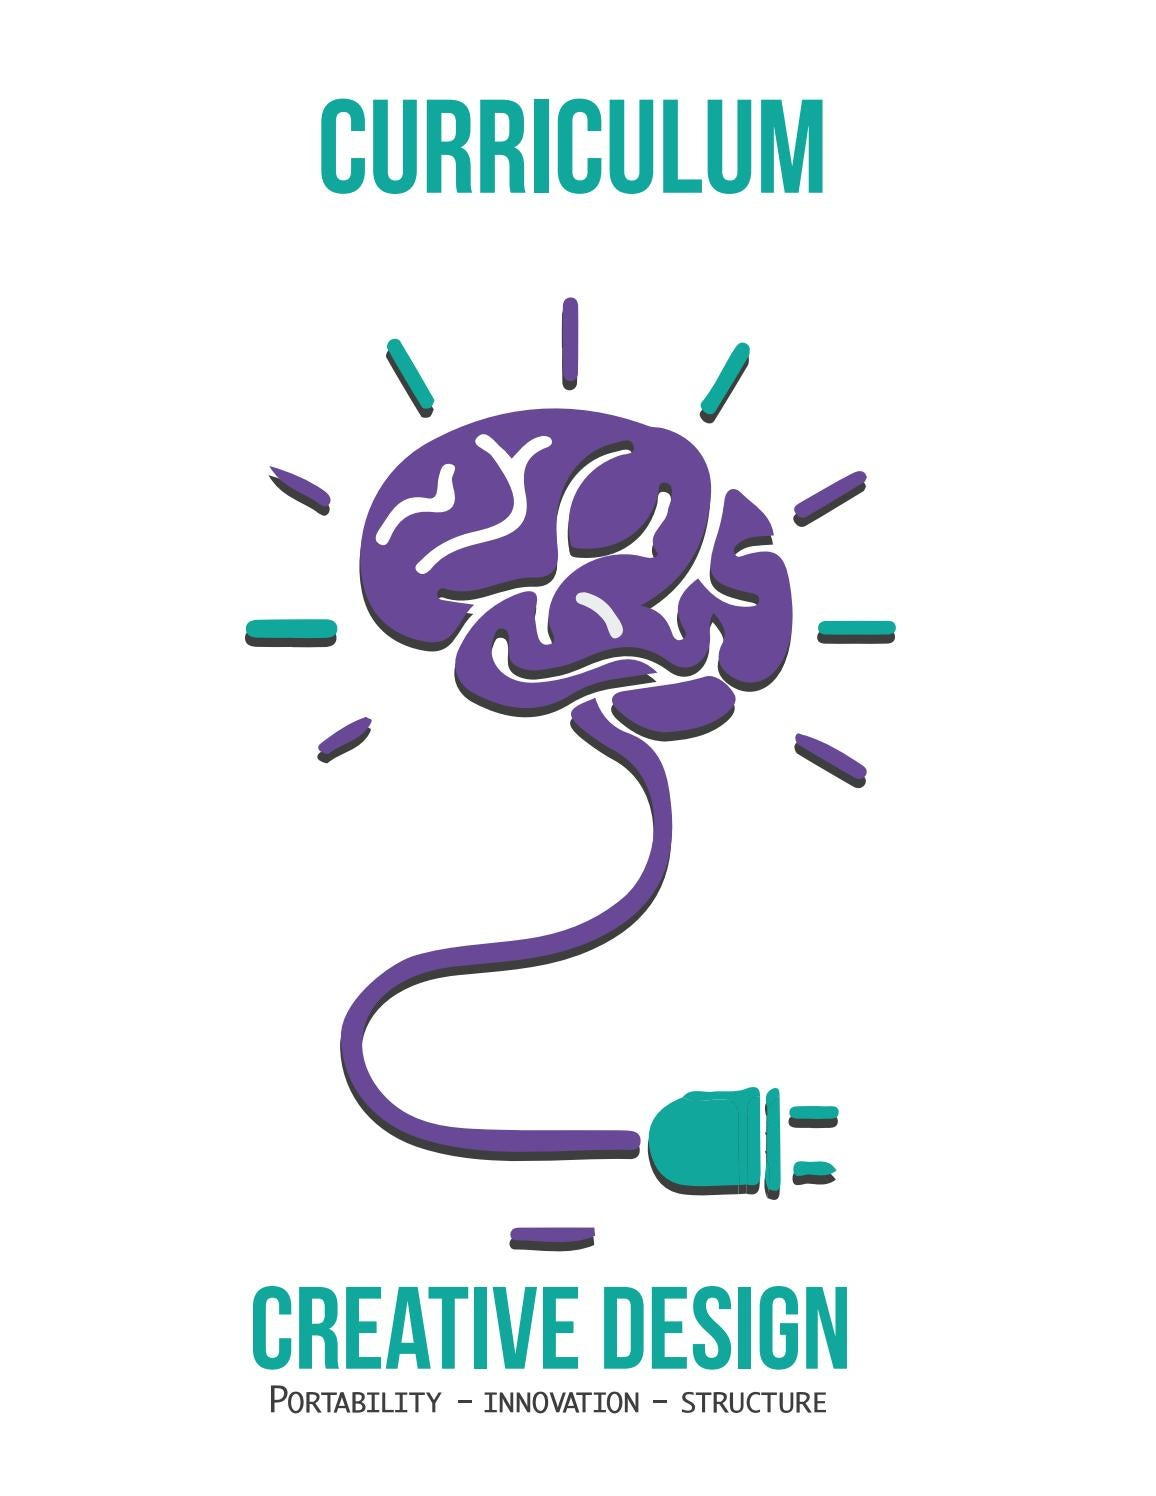 Investigación de curriculum creative design by Jezzii Muñoz - issuu